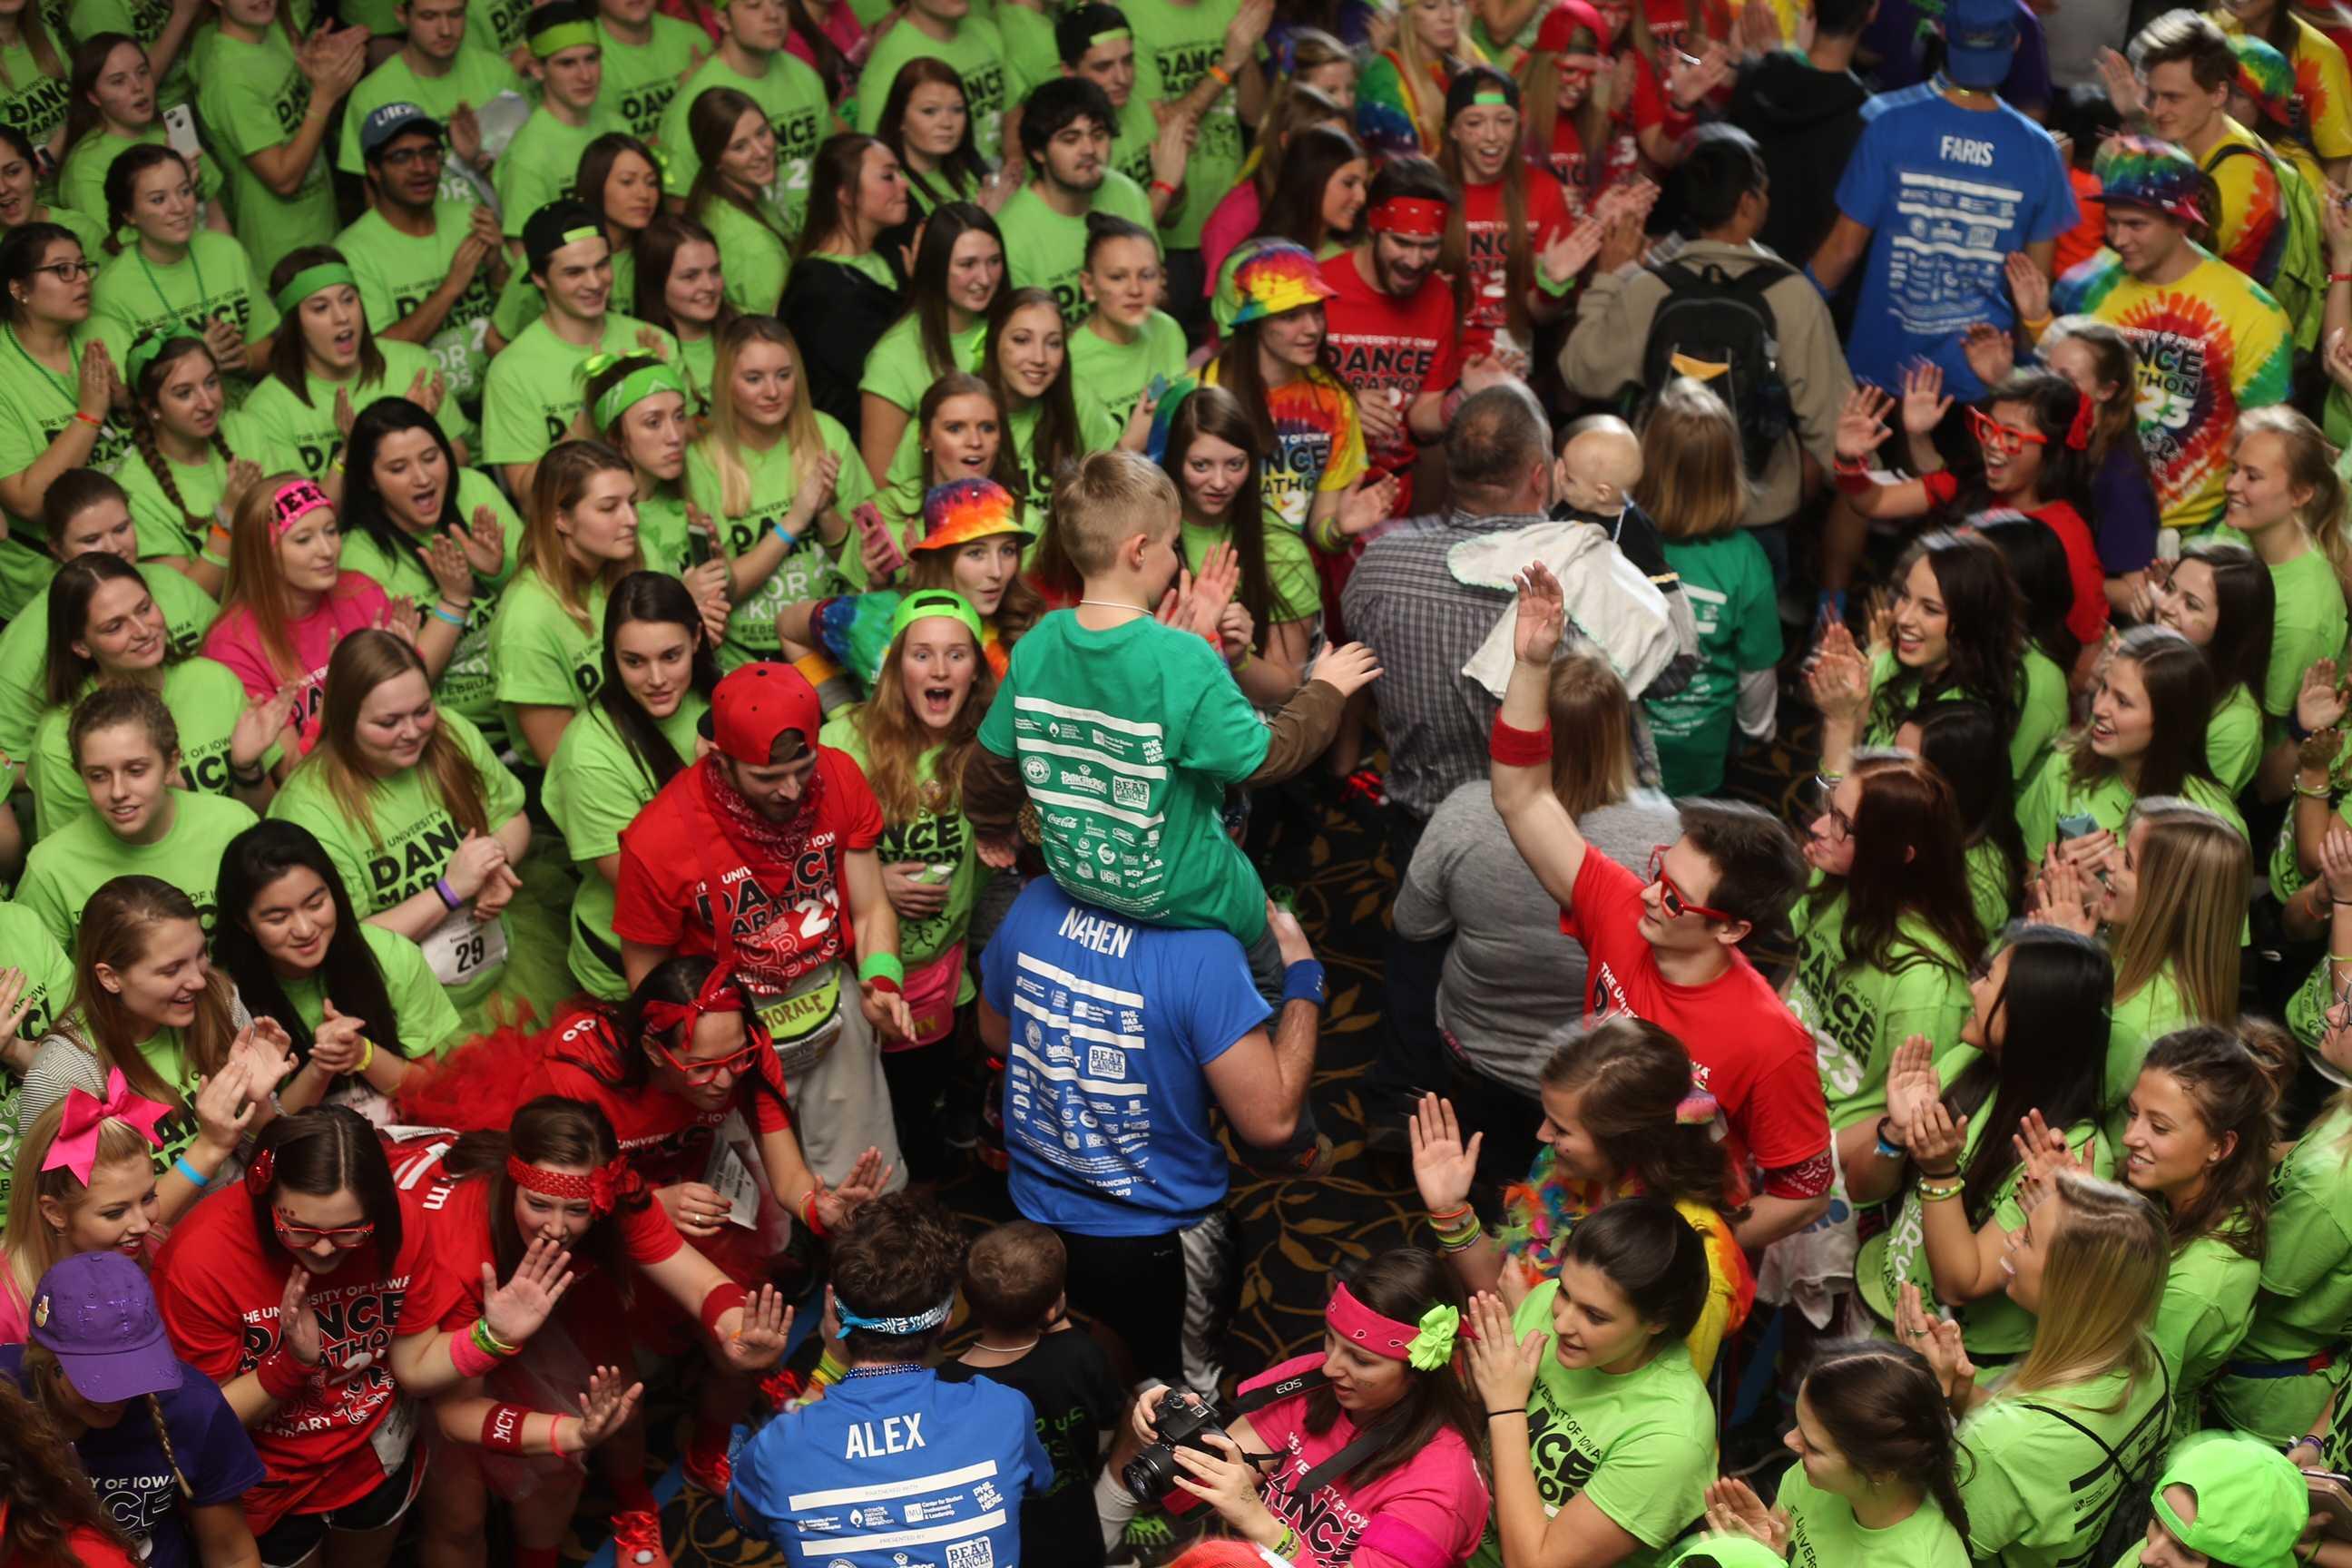 Dance Marathon 23 families make big entrance